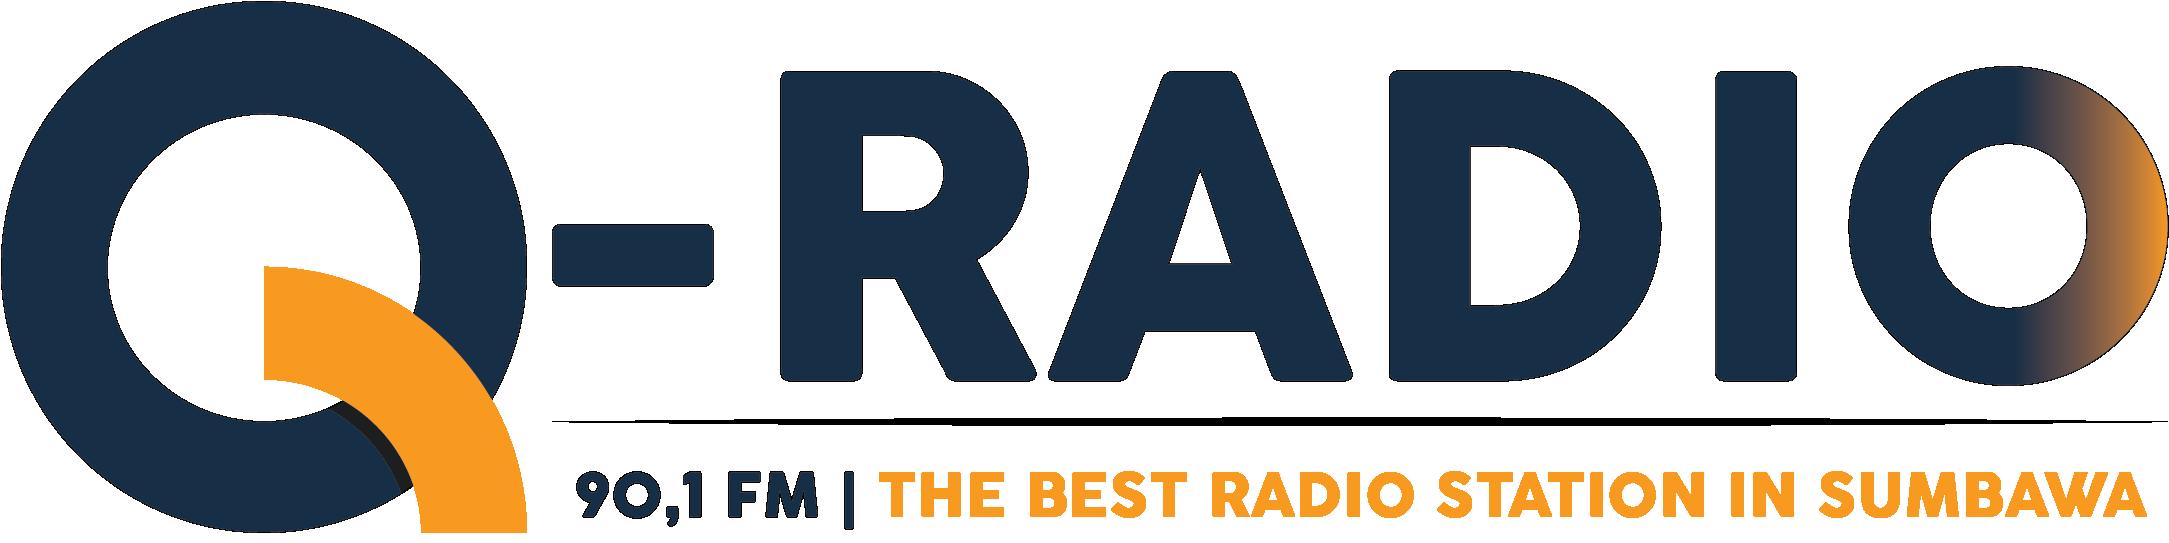 Q Radio Sumbawa | 90,1 FM - The Best Radio Station In Sumbawa